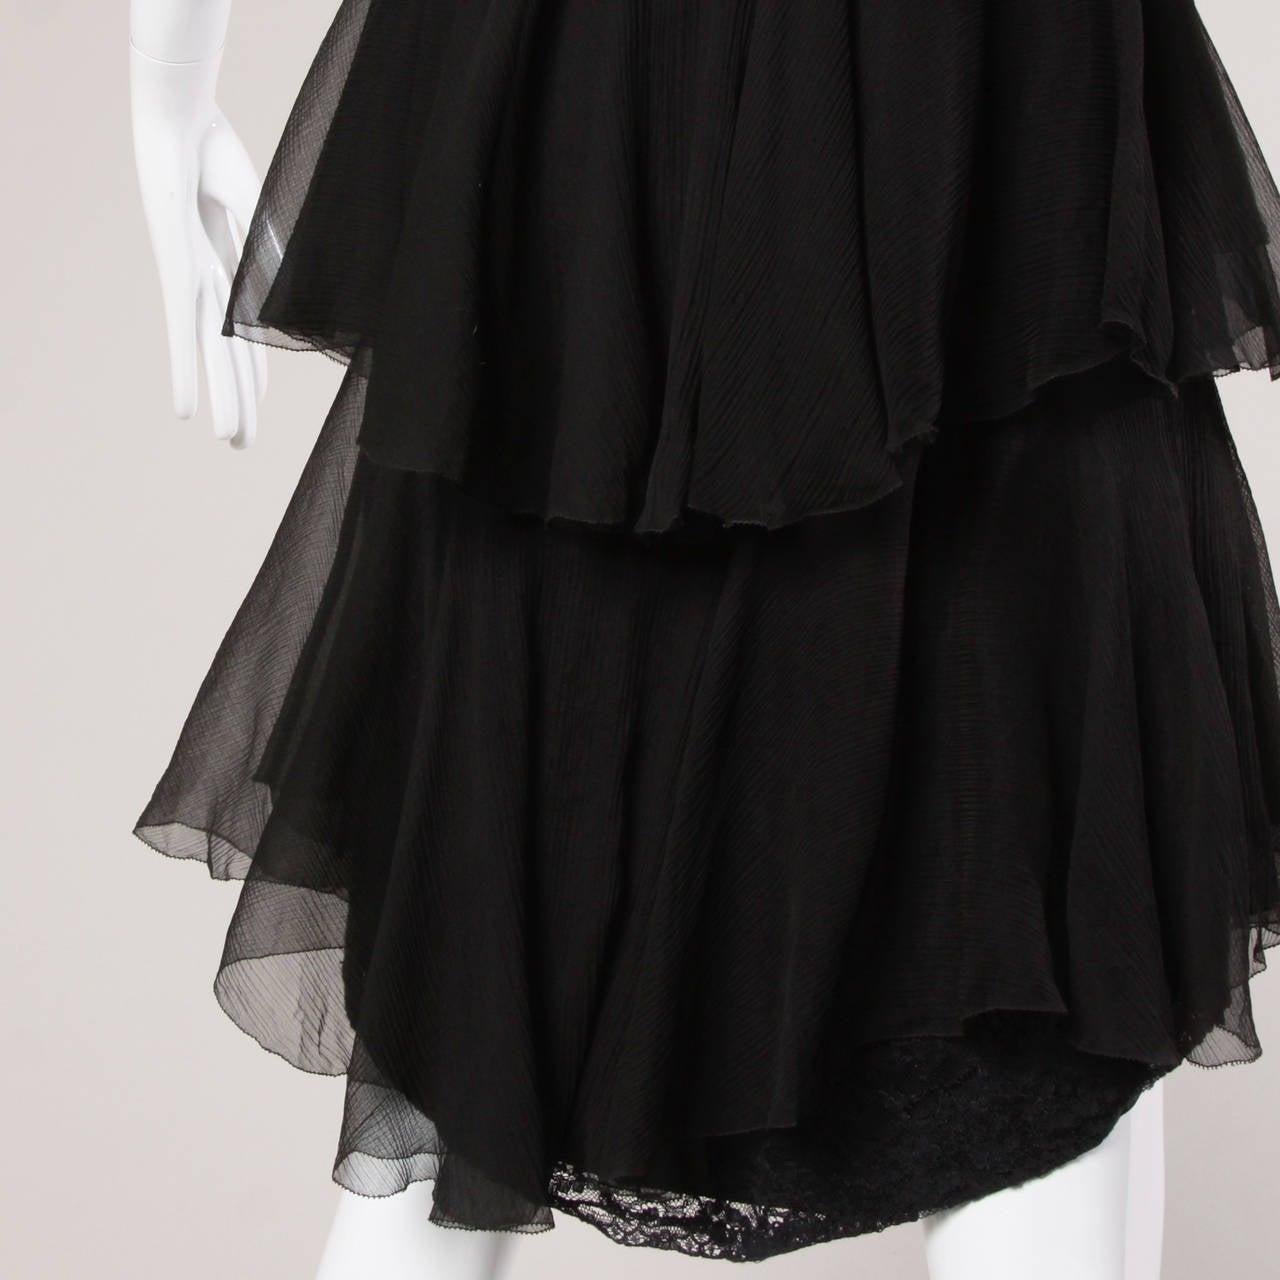 04b443fb9768e 1920s Vintage Black Silk Chiffon Flapper Dress with Rhinestone Belt For Sale  1